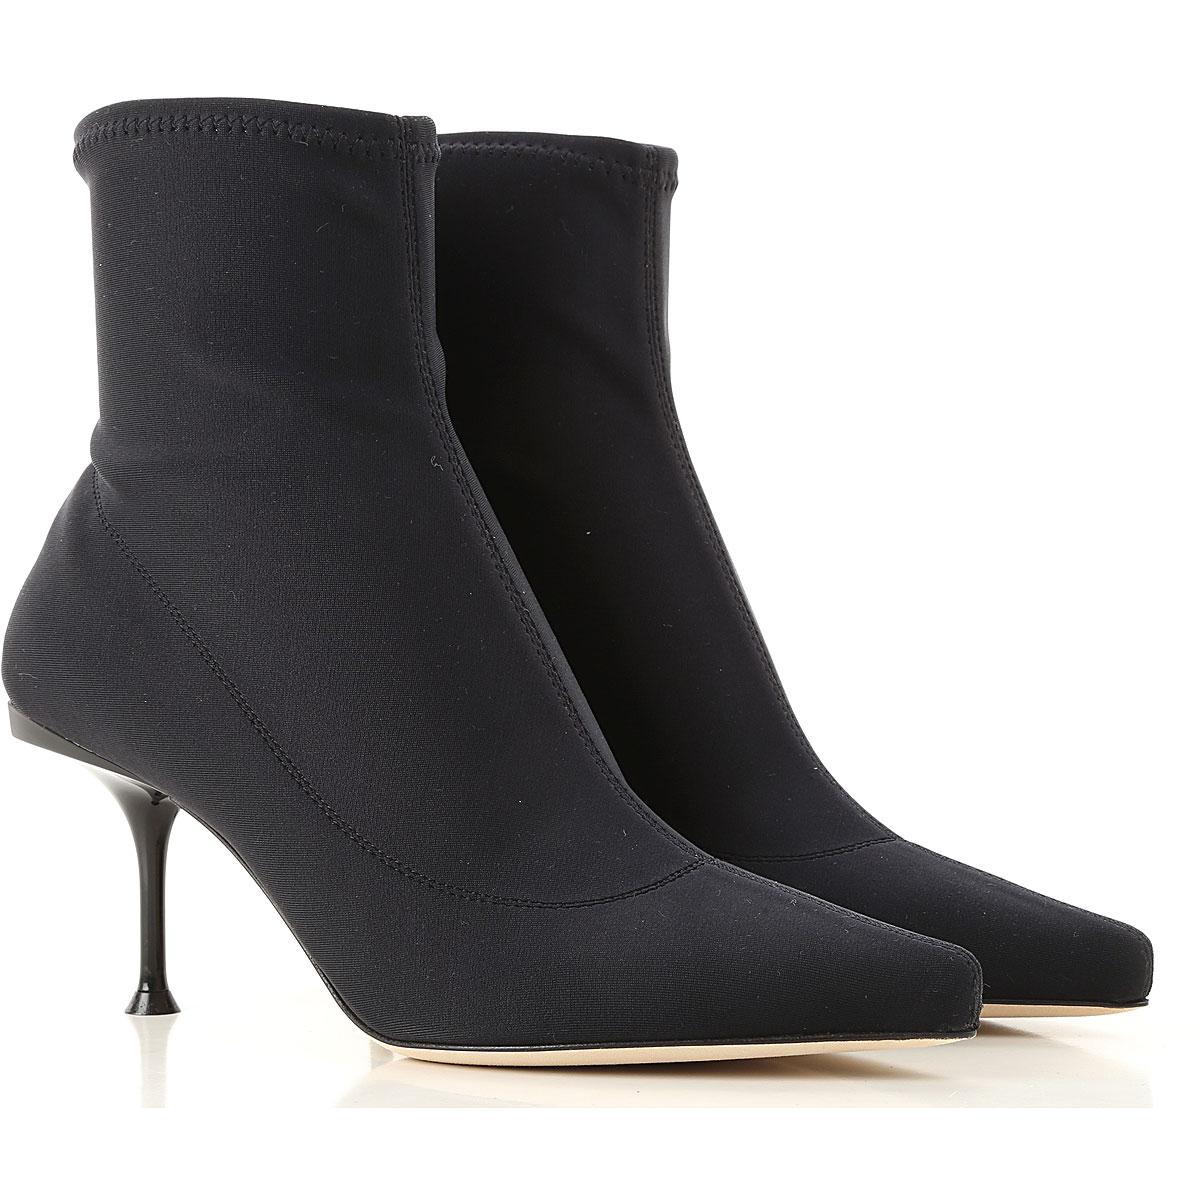 Image of Sergio Rossi Boots for Women, Booties, Black, Elastane, 2017, 10 6 6.5 7 8.5